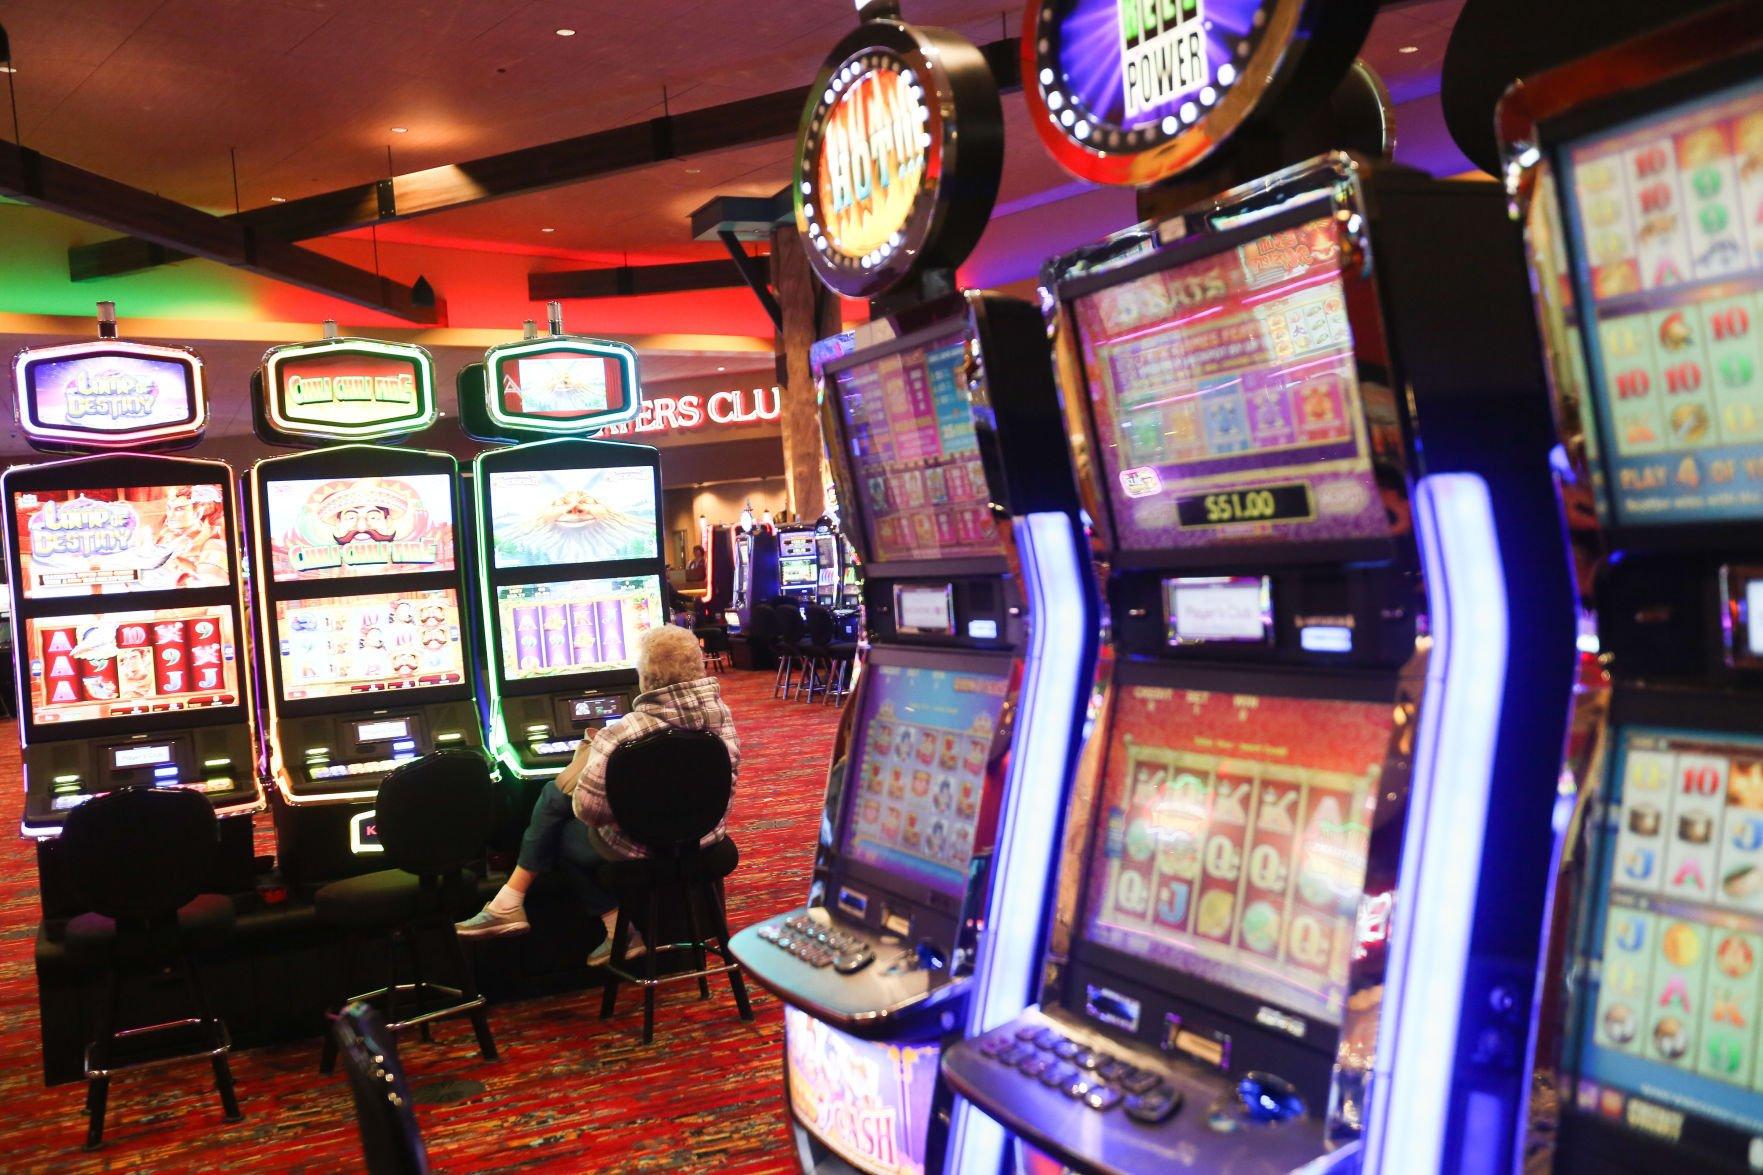 Economy casino online casino with moneybookers